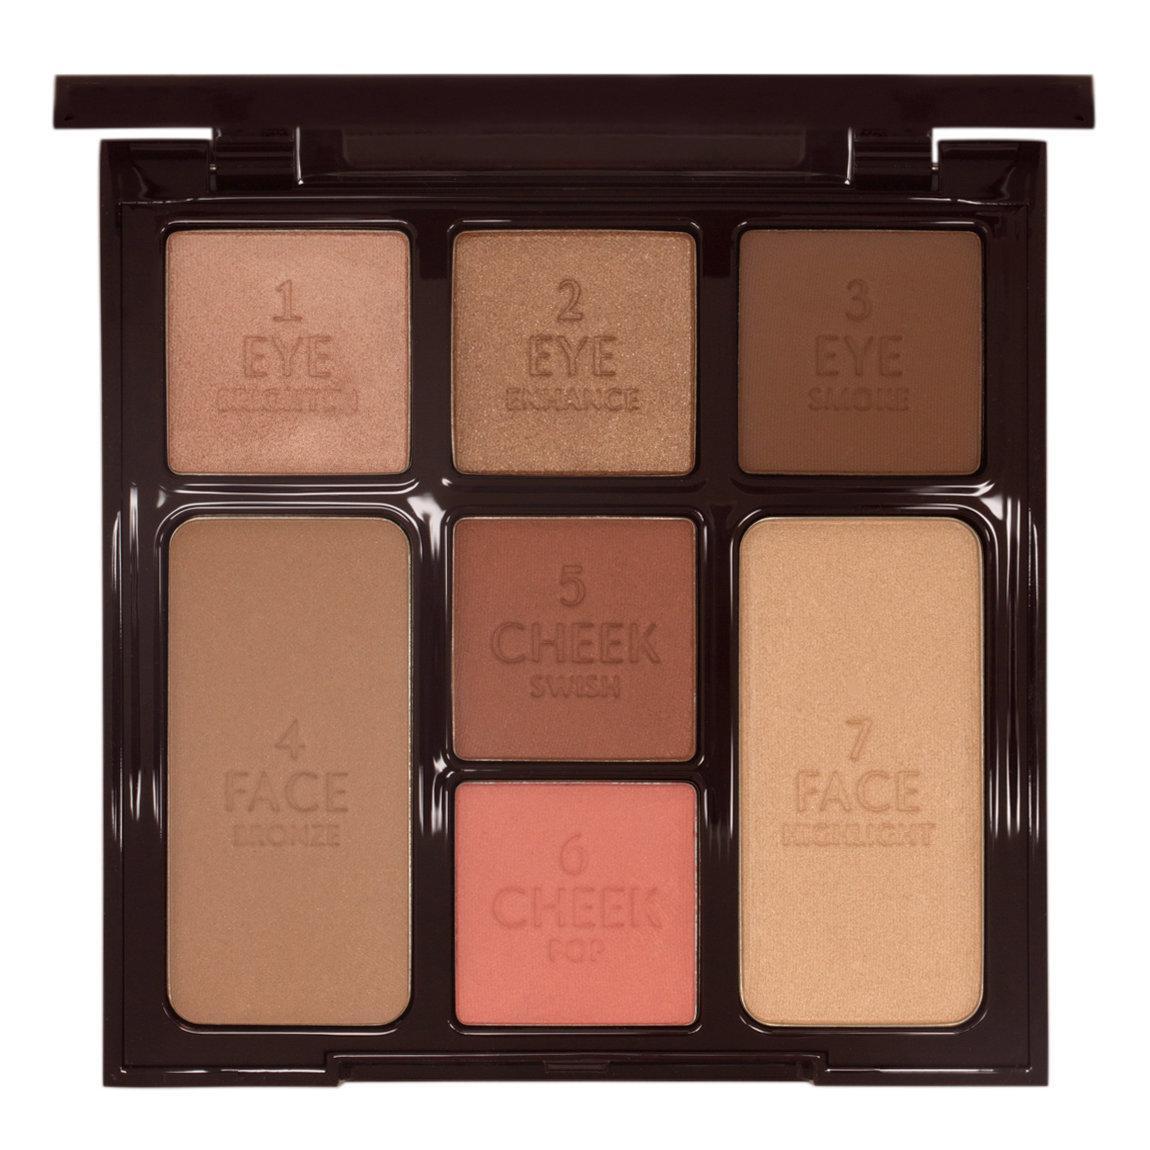 CHARLOTTE TILBURY Instant Look in a Palette Beauty Glow